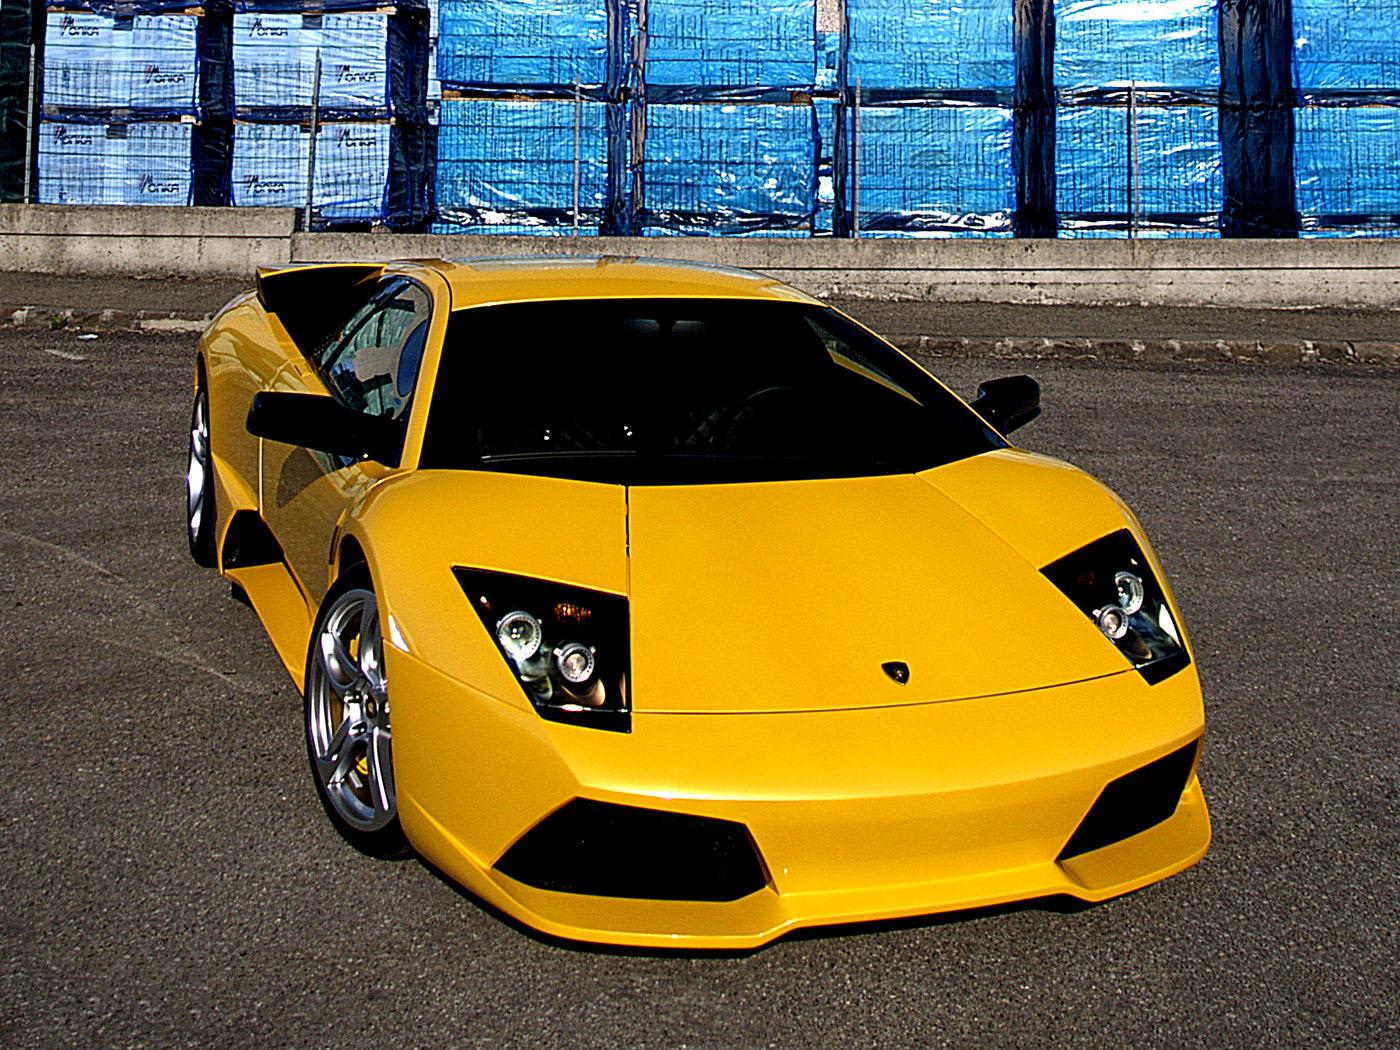 You can vote for this Lamborghini Murcielago LP640 photo